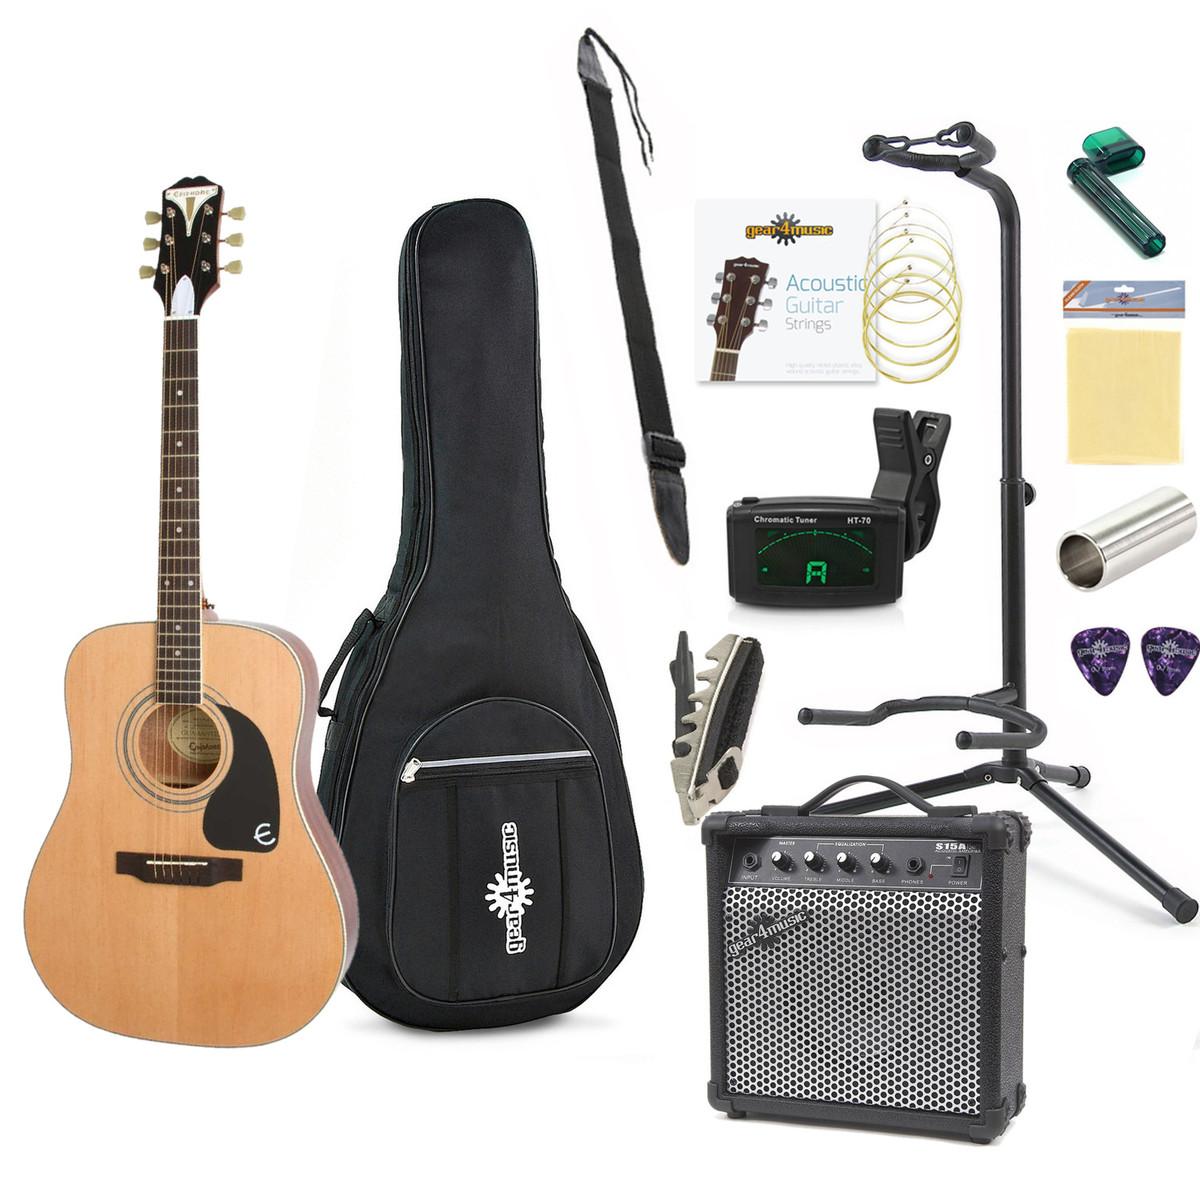 epiphone pro 1 ultra d butants guitare electro acoustique. Black Bedroom Furniture Sets. Home Design Ideas